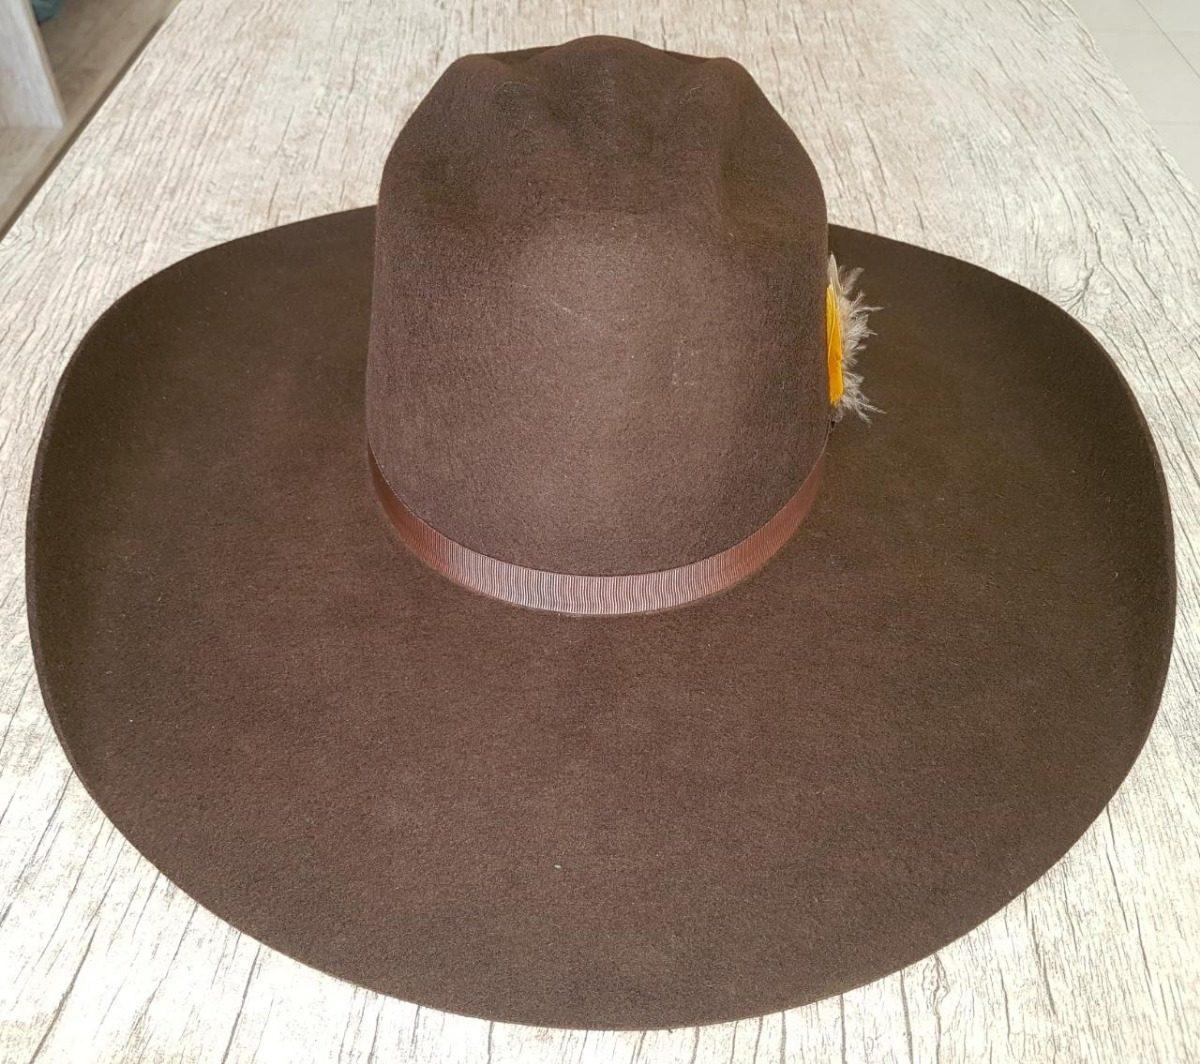 chapéu top bull lã 30x marrom copa cavaleiro. Carregando zoom. fcaeecce8eb